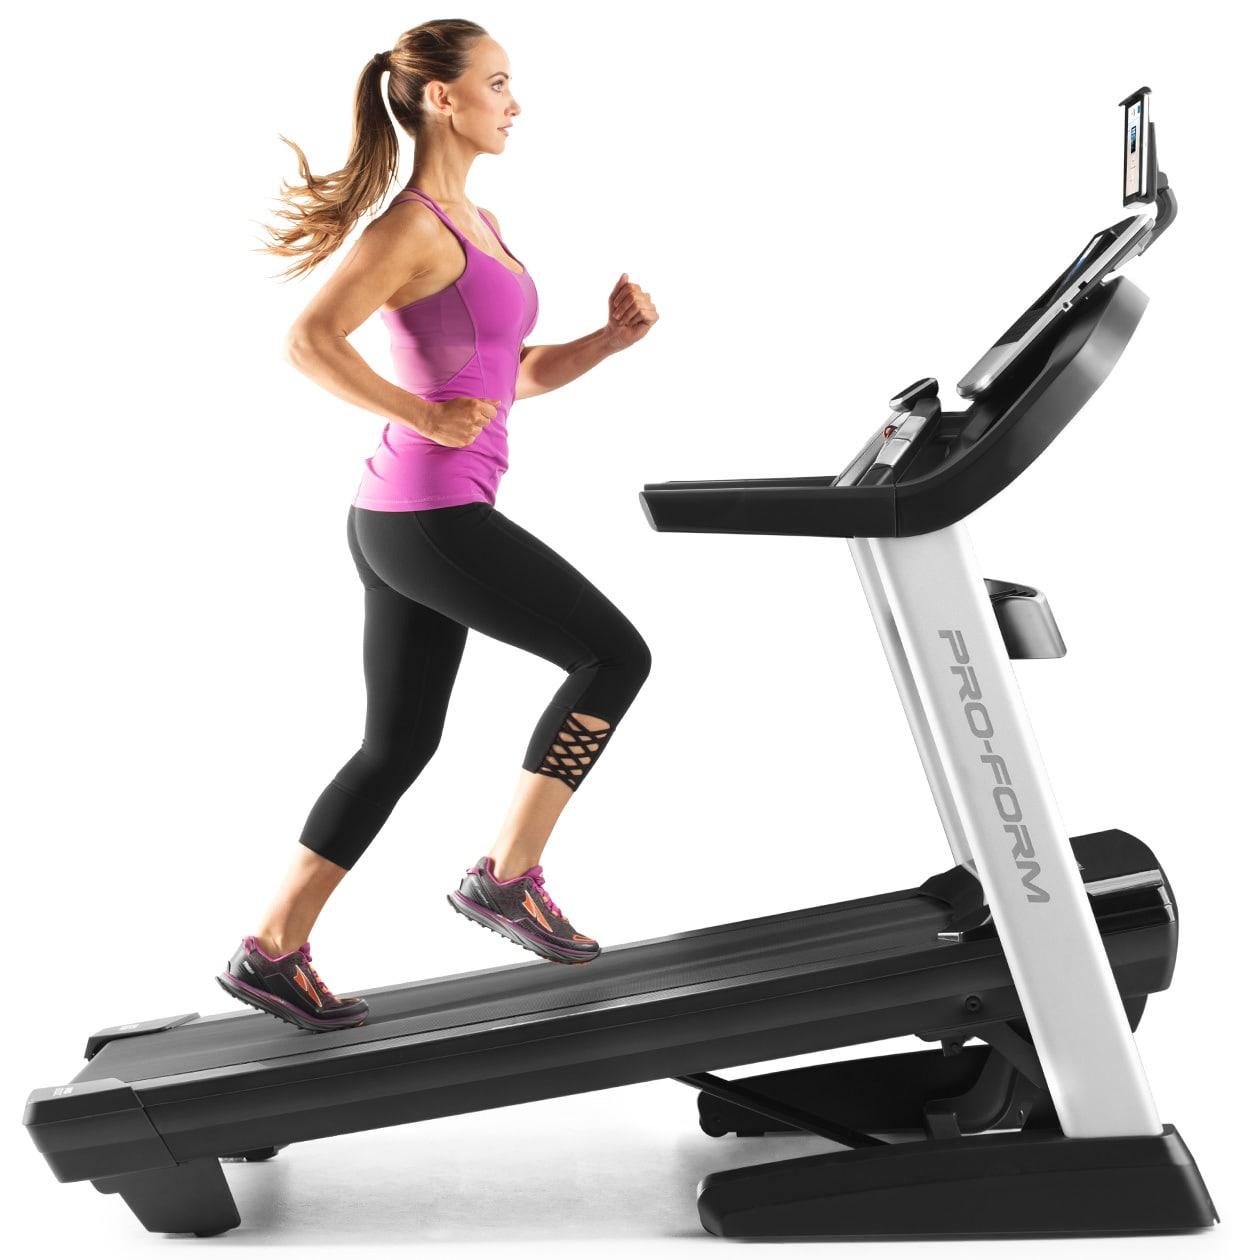 Workout Warehouse Treadmills ProForm Pro 9000  gallery image 4